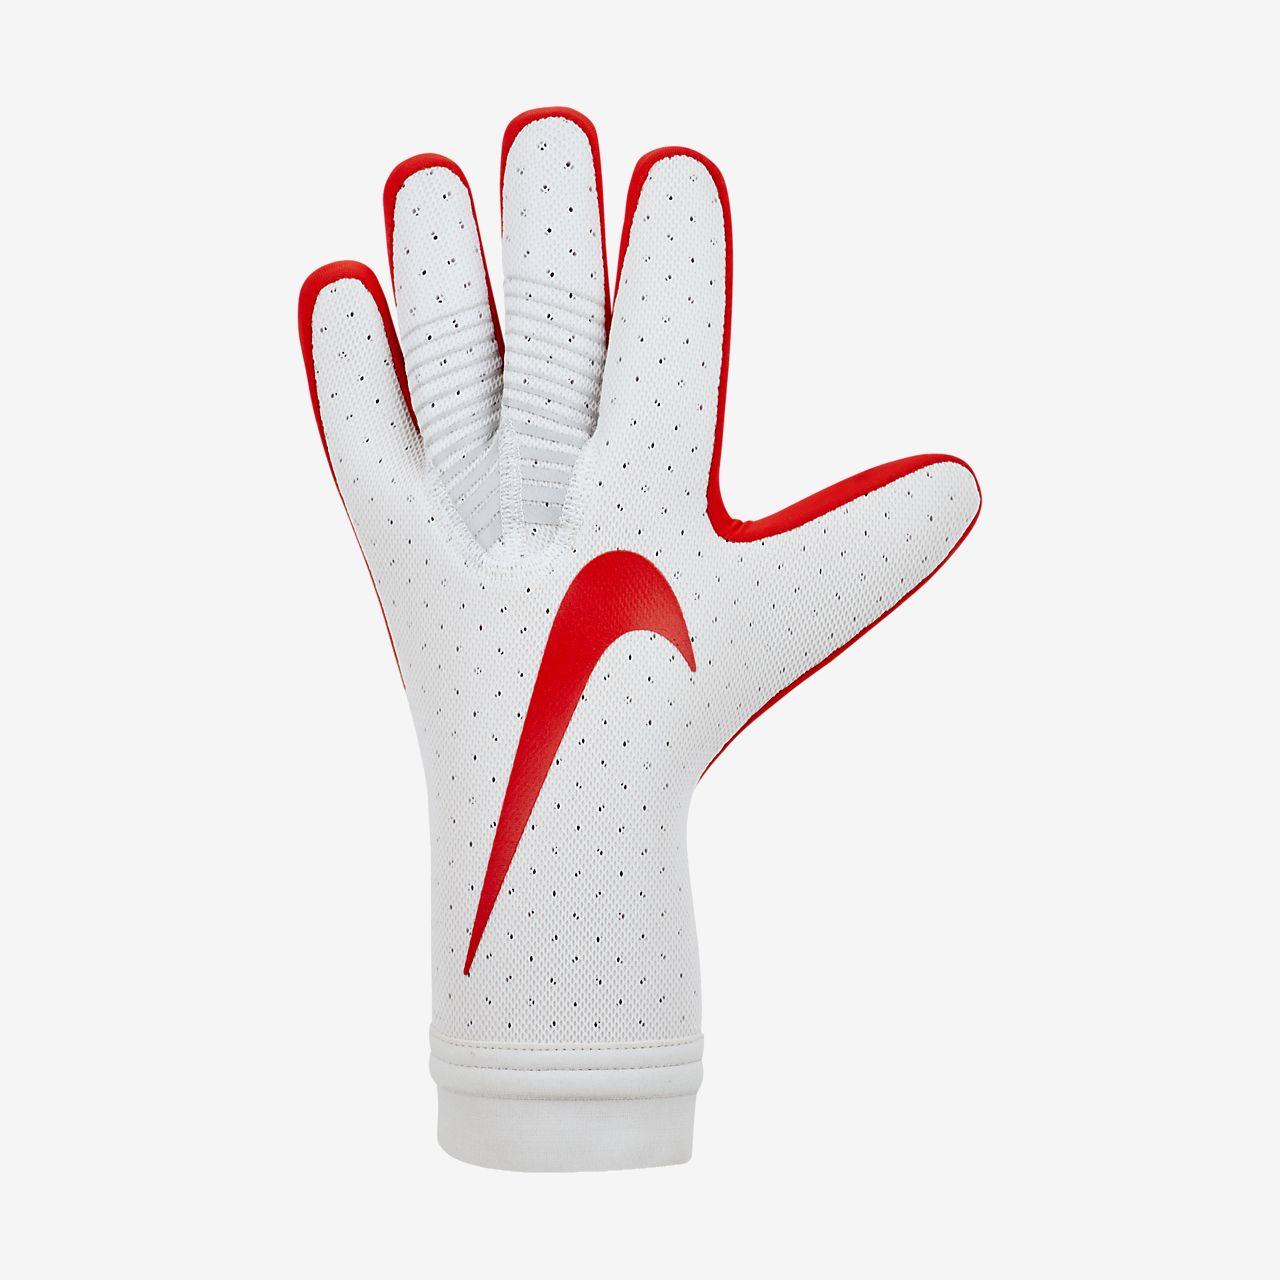 c9e0c5c20 Guantes de fútbol Nike Goalkeeper Touch Elite. Nike.com CL